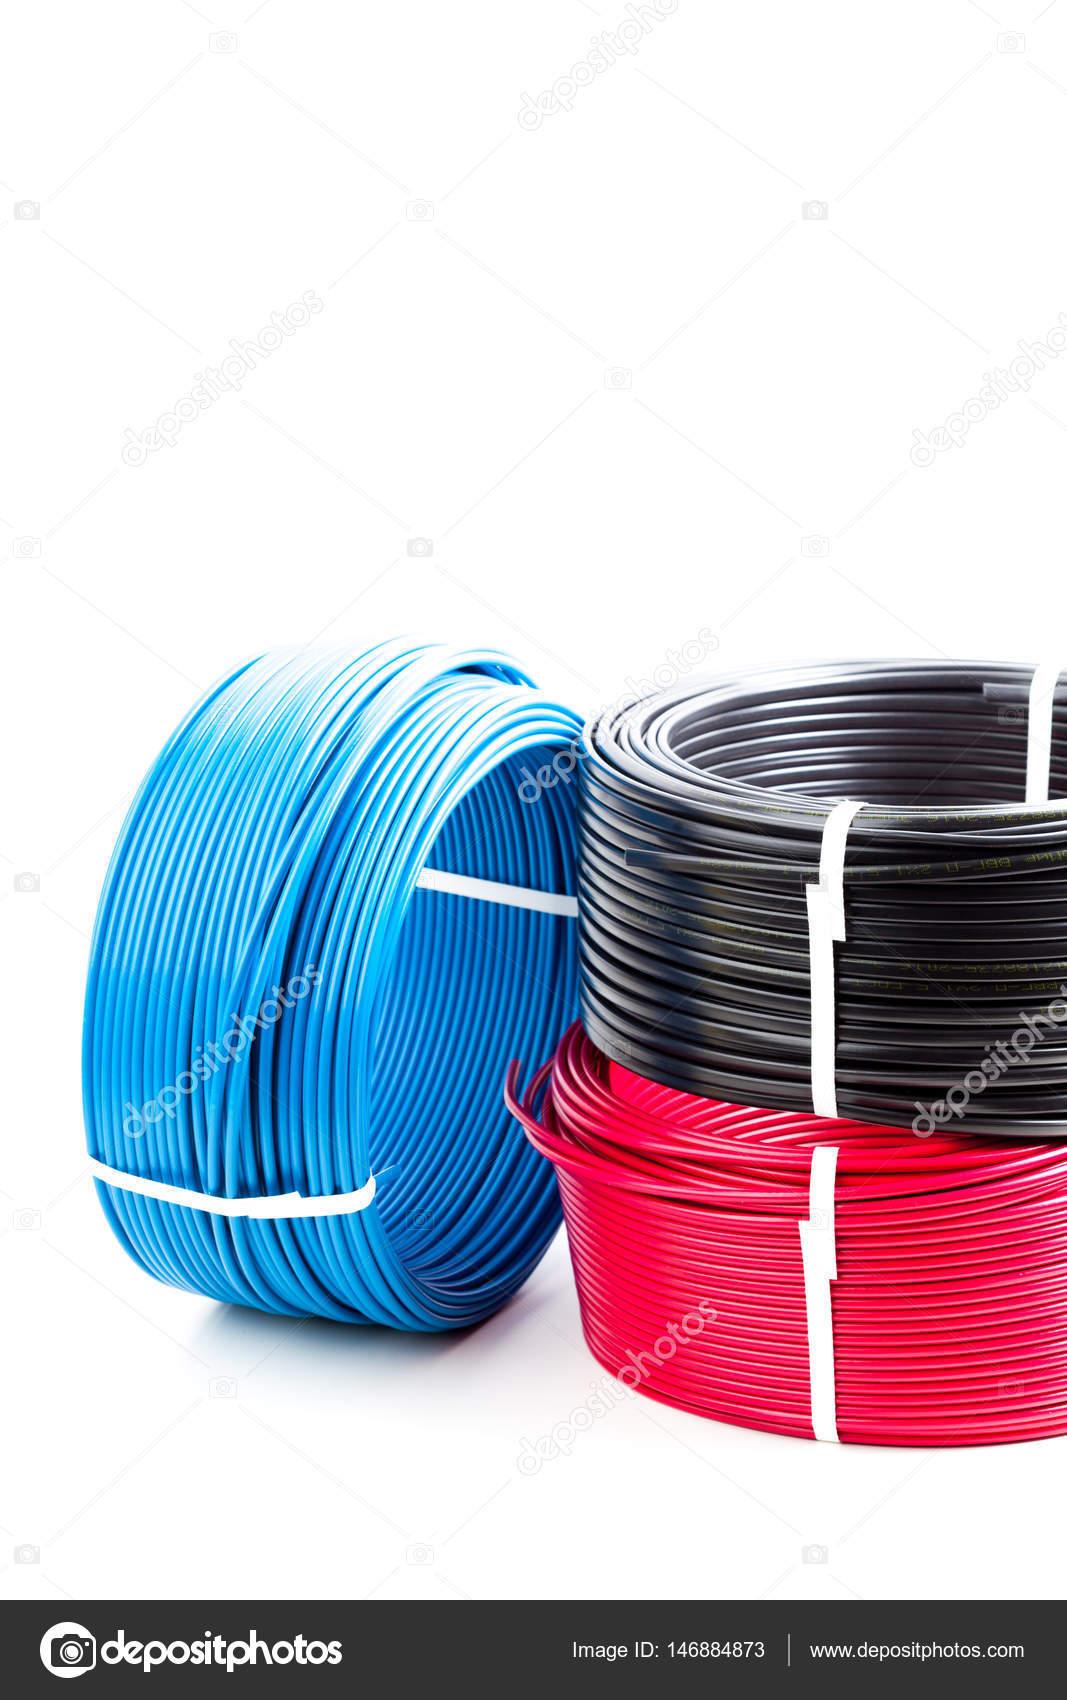 Farbige Elektrokabel farbige kabel stockfoto fotofabrika 146884873